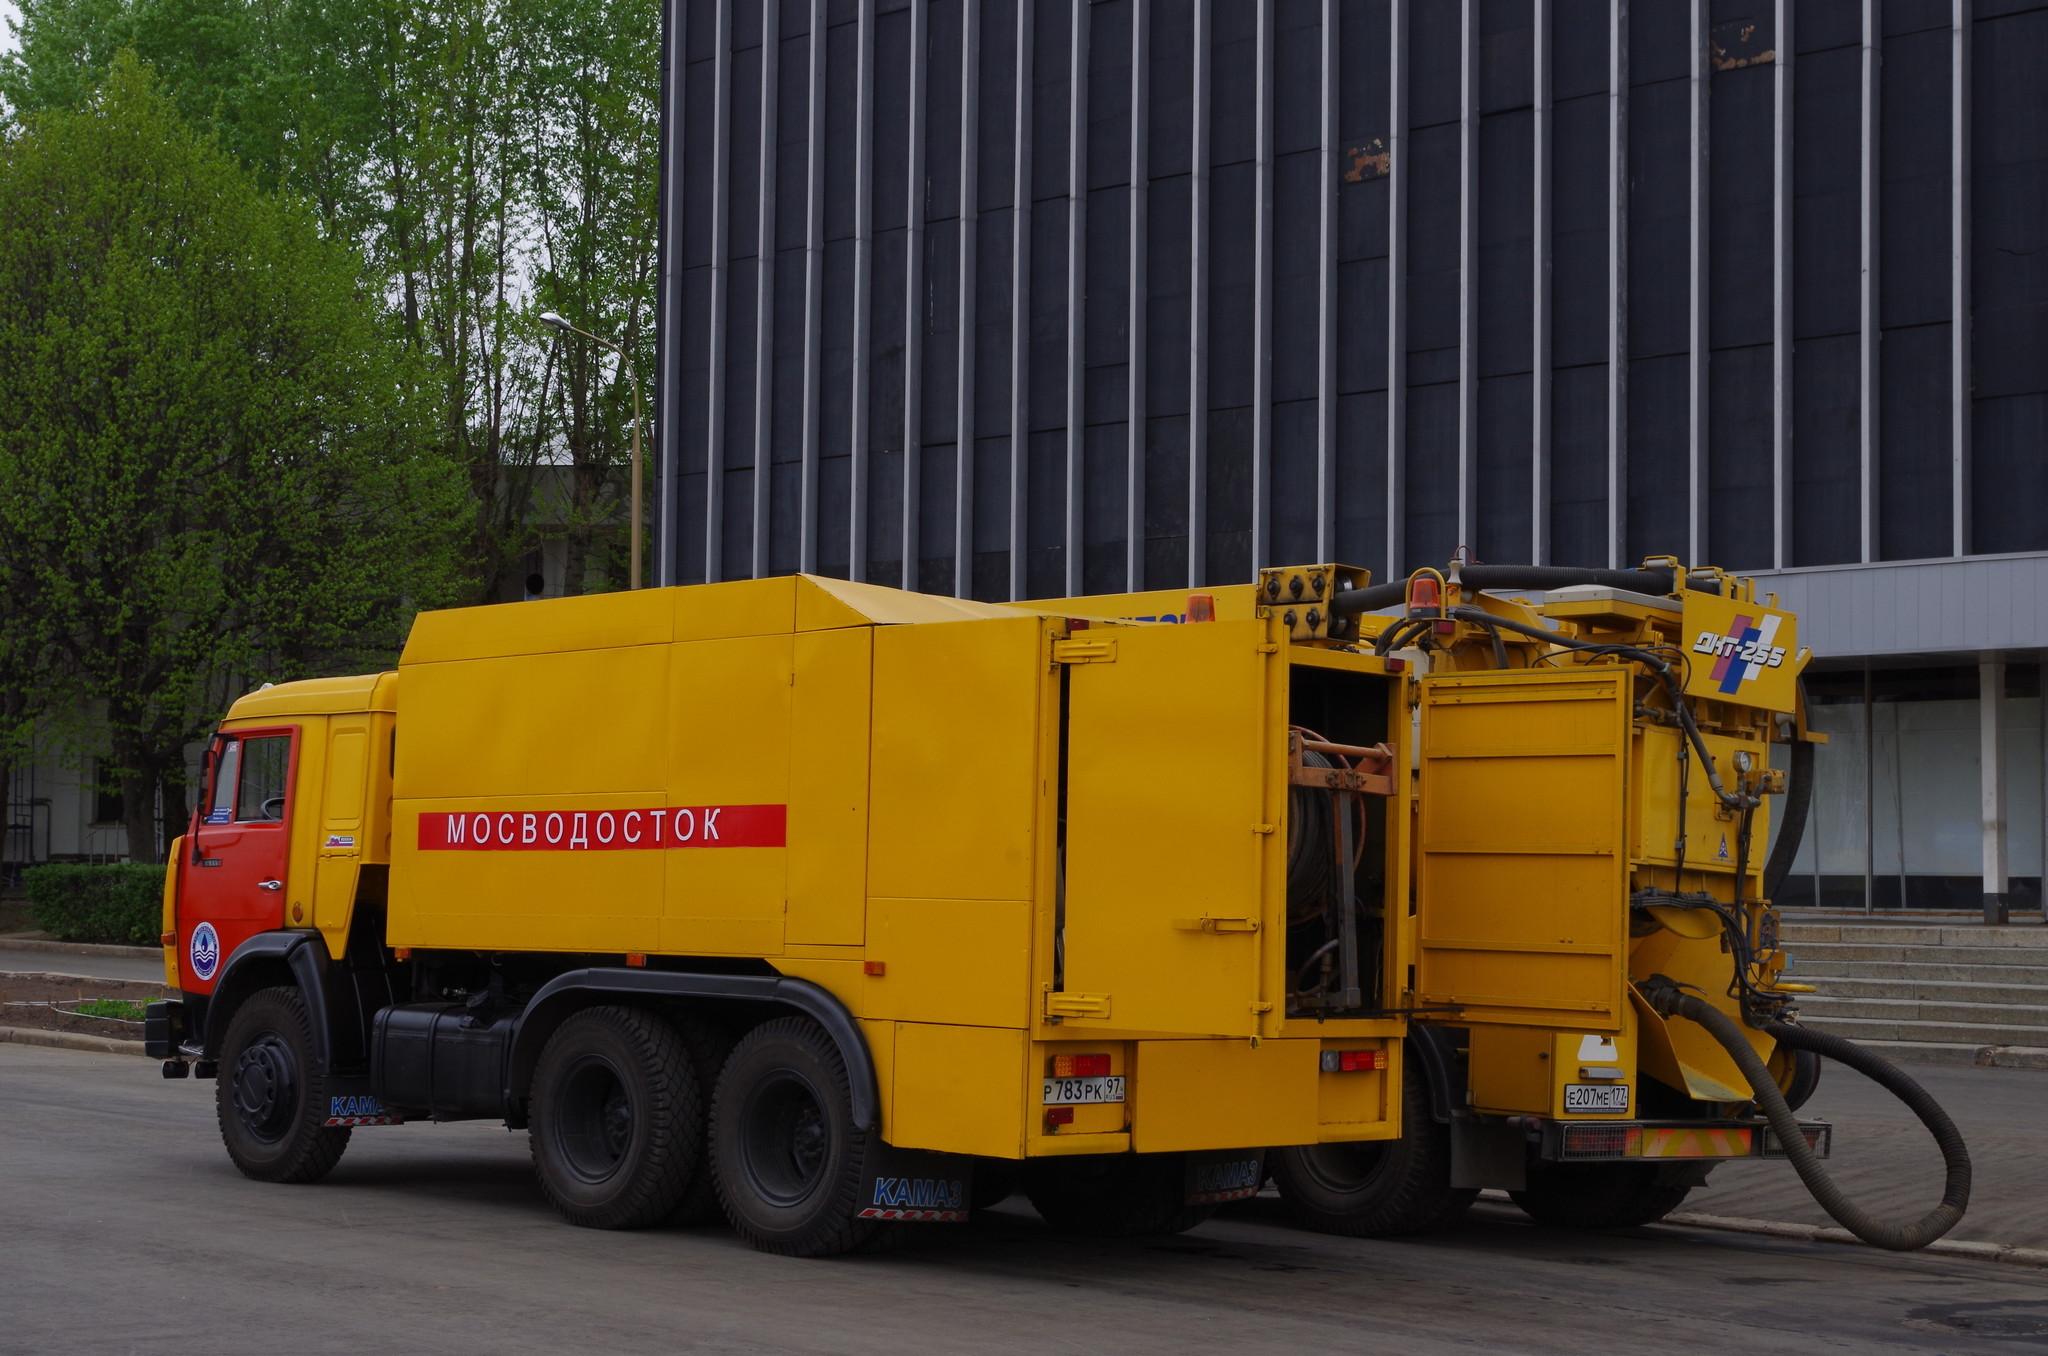 Комбинированная машина ДКТ-255 на шасси КамАЗа ГУП